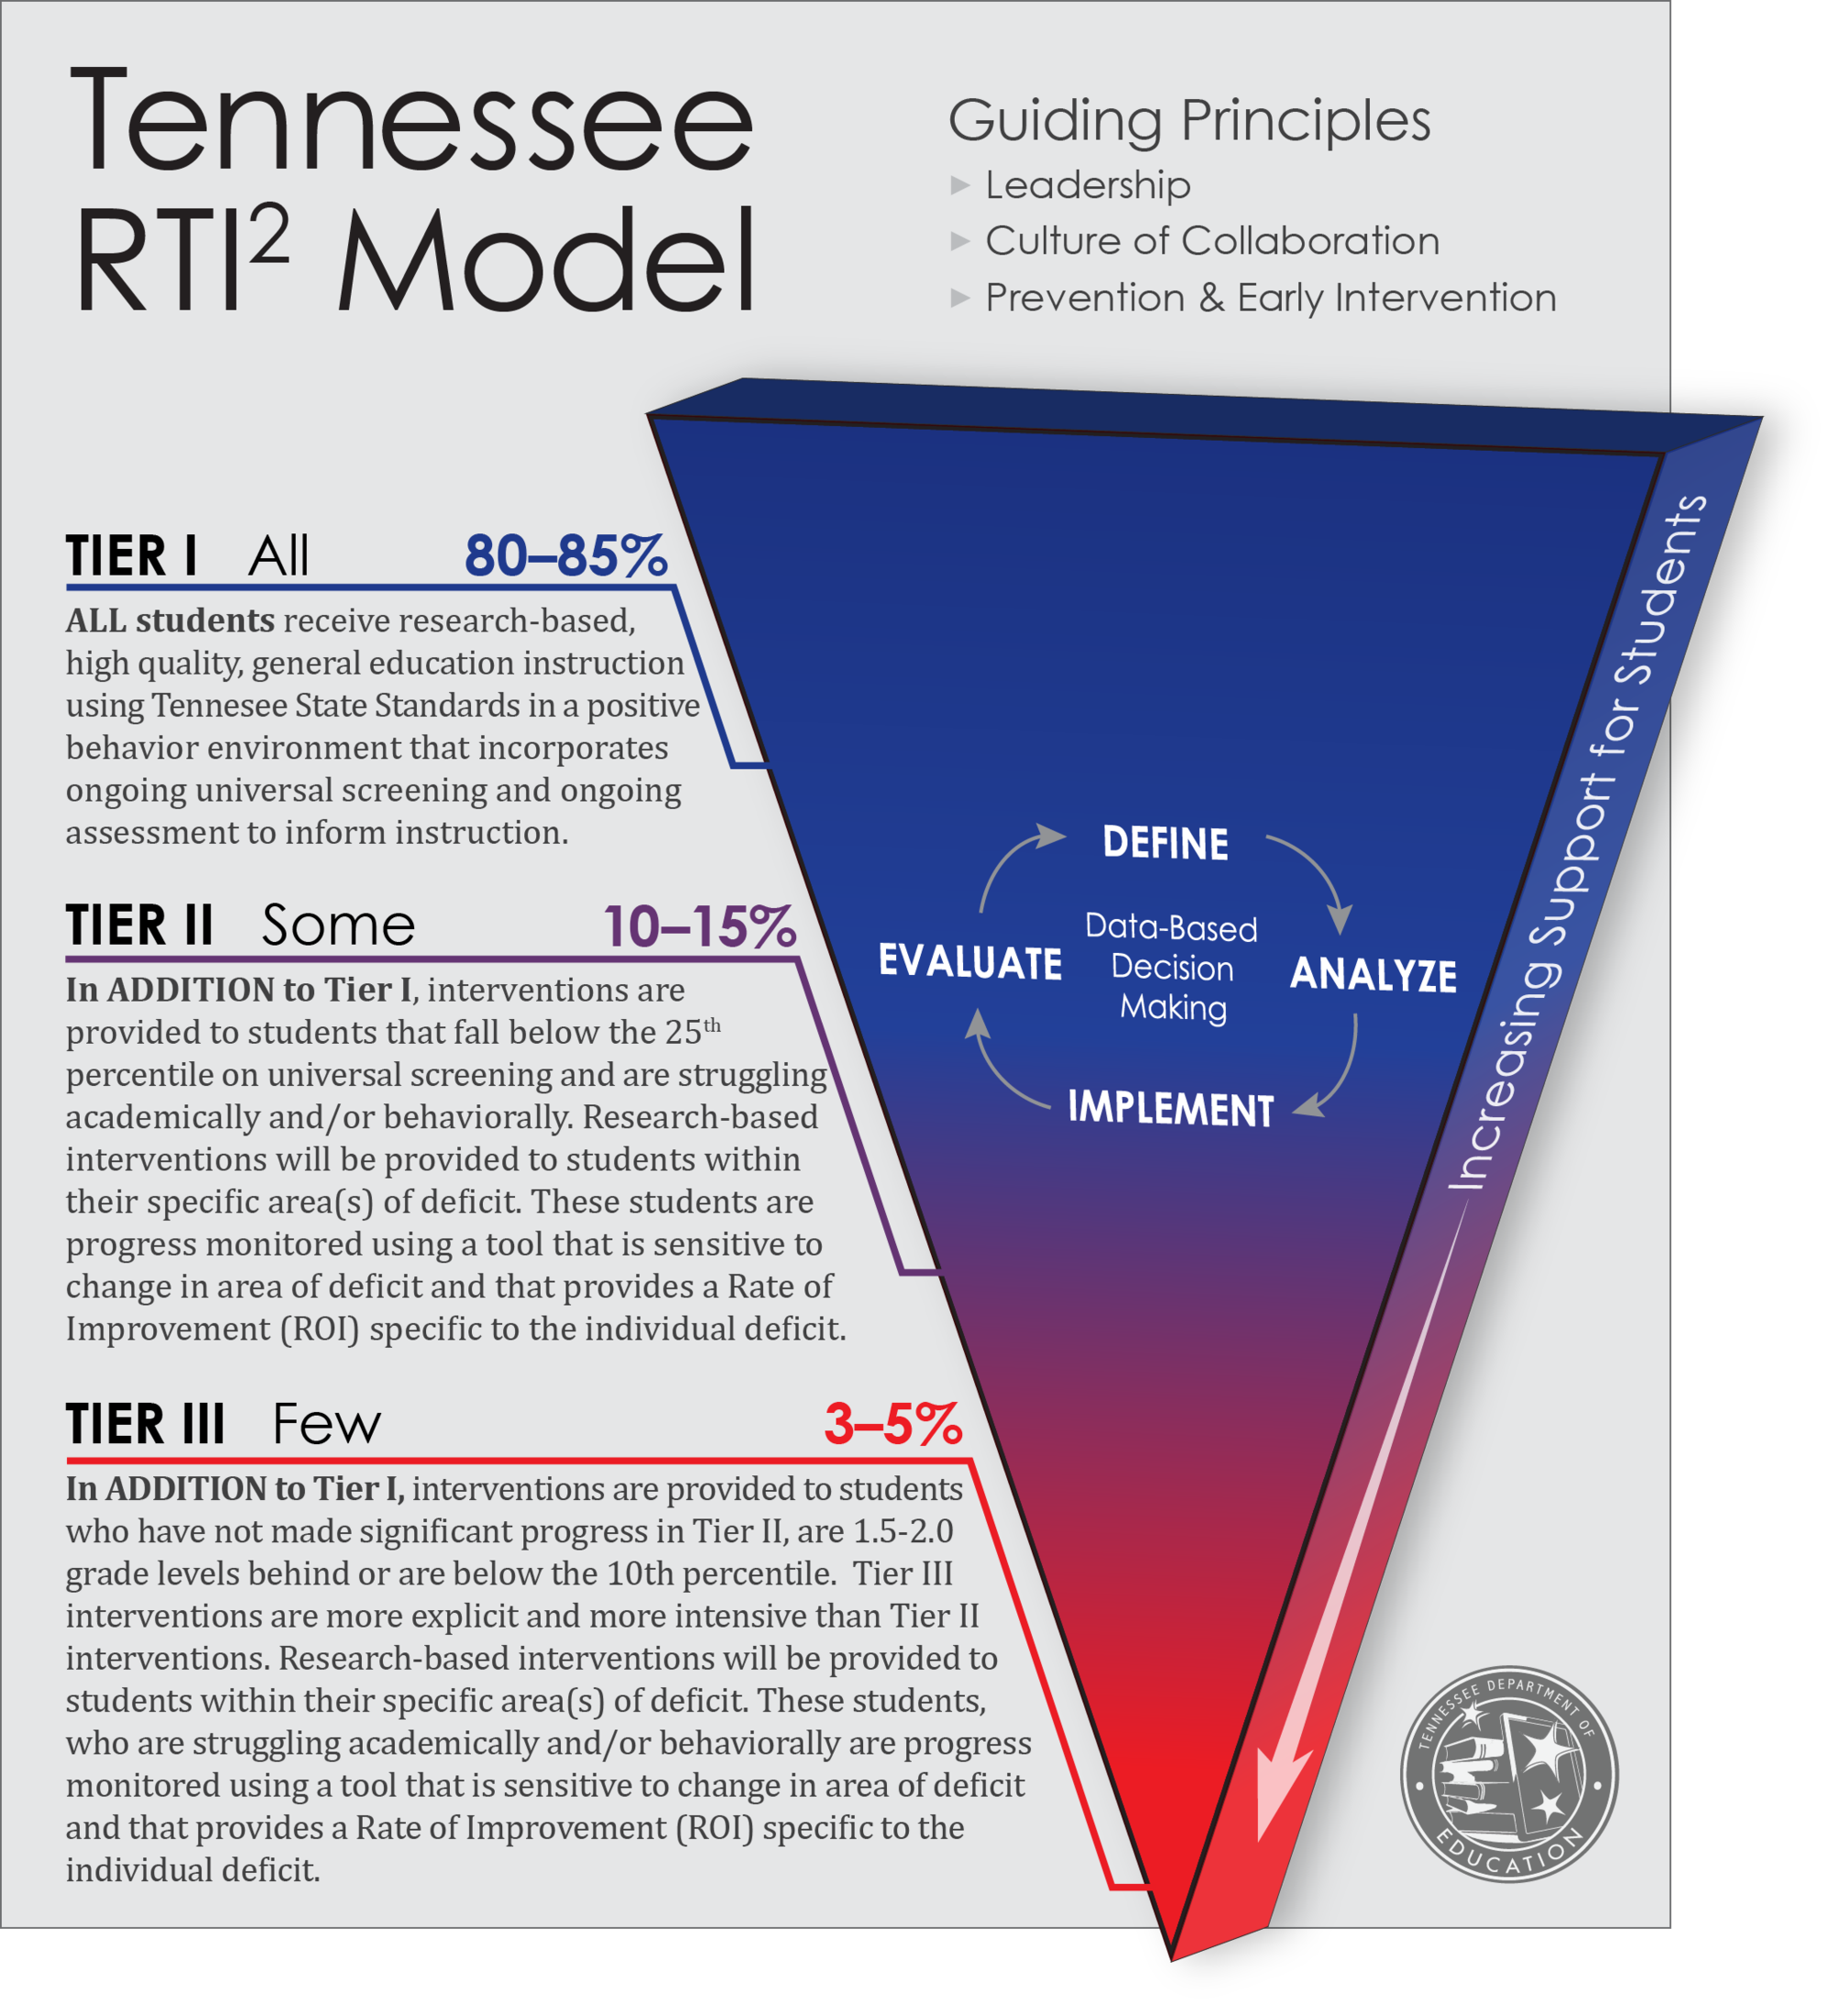 Tennessee RTI Model